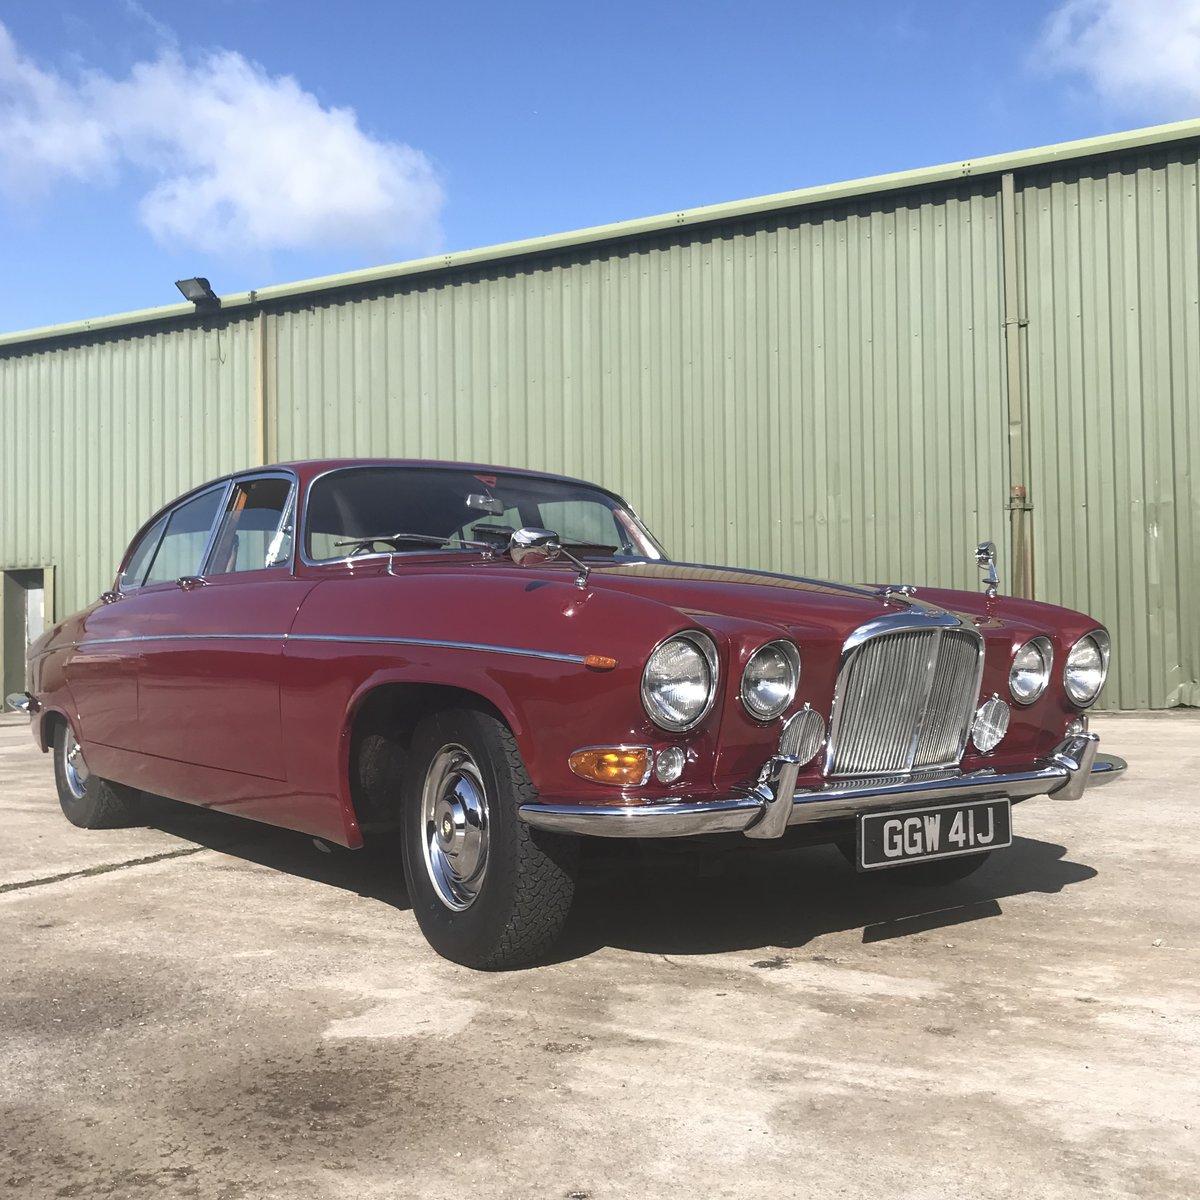 Jaguar 420G - 1970 Regency Red & Cinnamon Leather For Sale (picture 1 of 6)